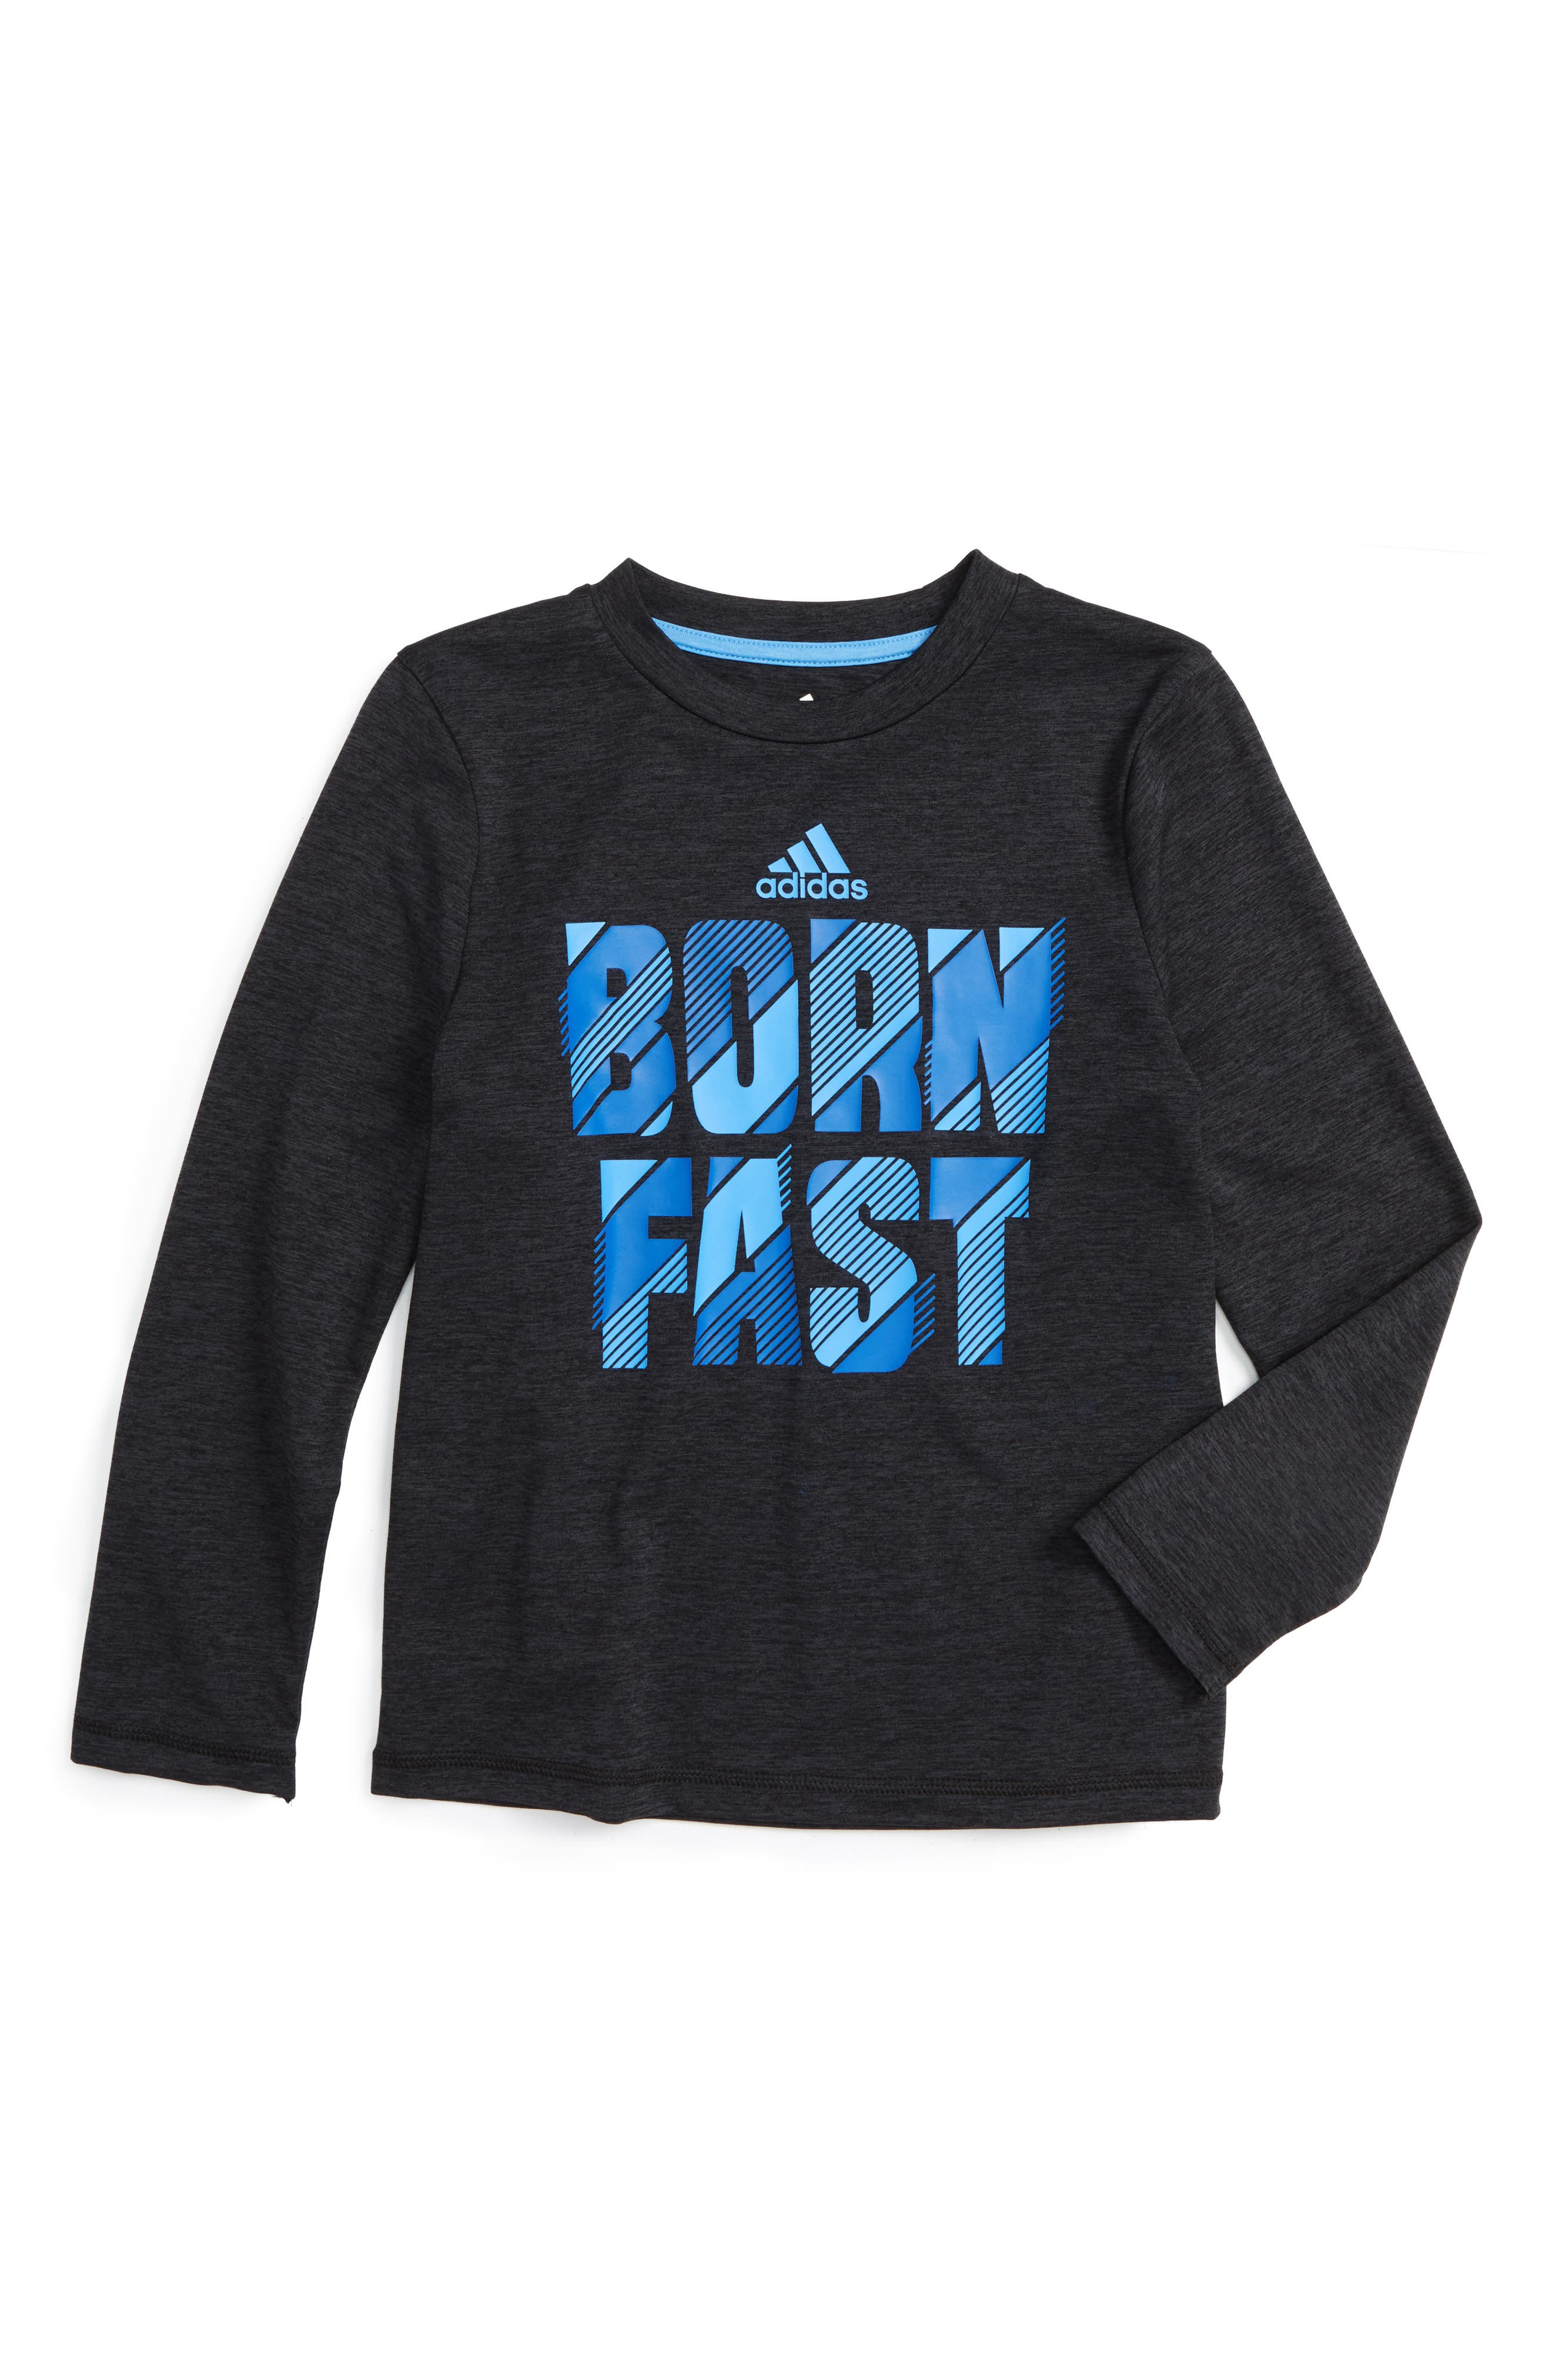 Adidas Little Boys Graphic Crew Neck Tee Shirt New